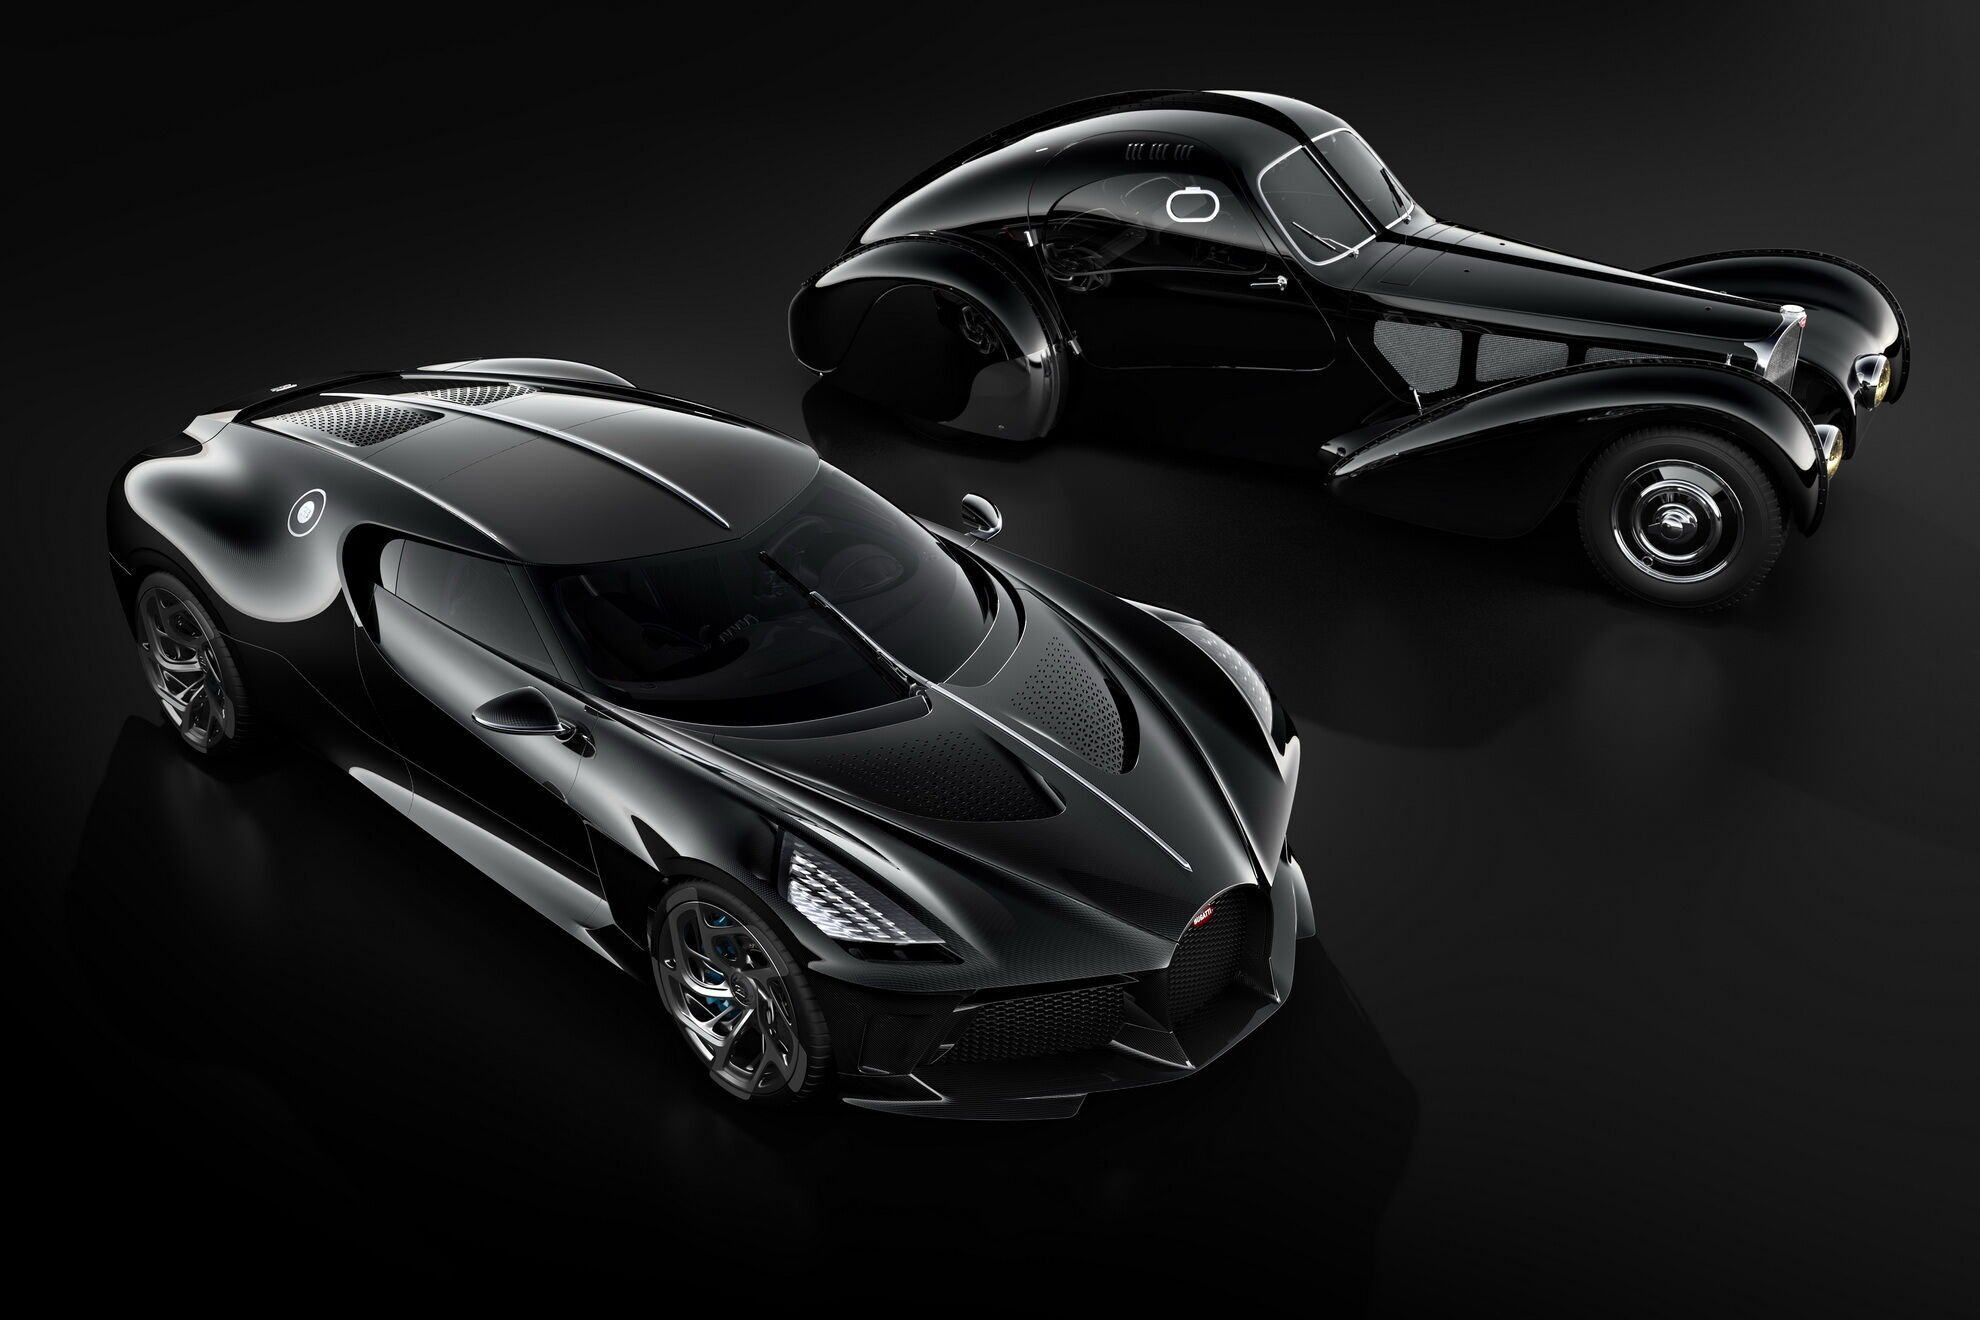 La Voiture Noire является современной интерпретацией машины Жана Бугатти Bugatti Type 57 SC Atlantic